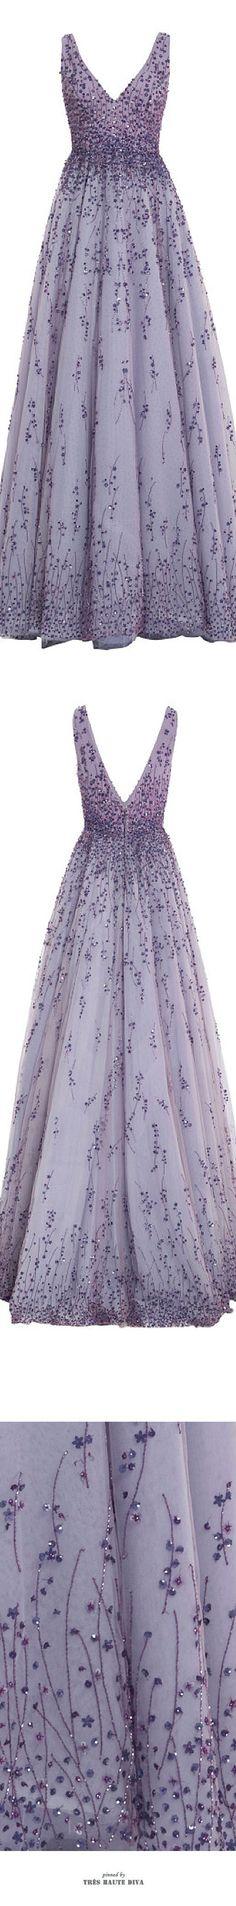 Feinsinnig, filigran und feminin! Robe in Lavendel (Farbpassnummer 16)  Kerstin Tomancok Farb-, Typ-, Stil & Imageberatung